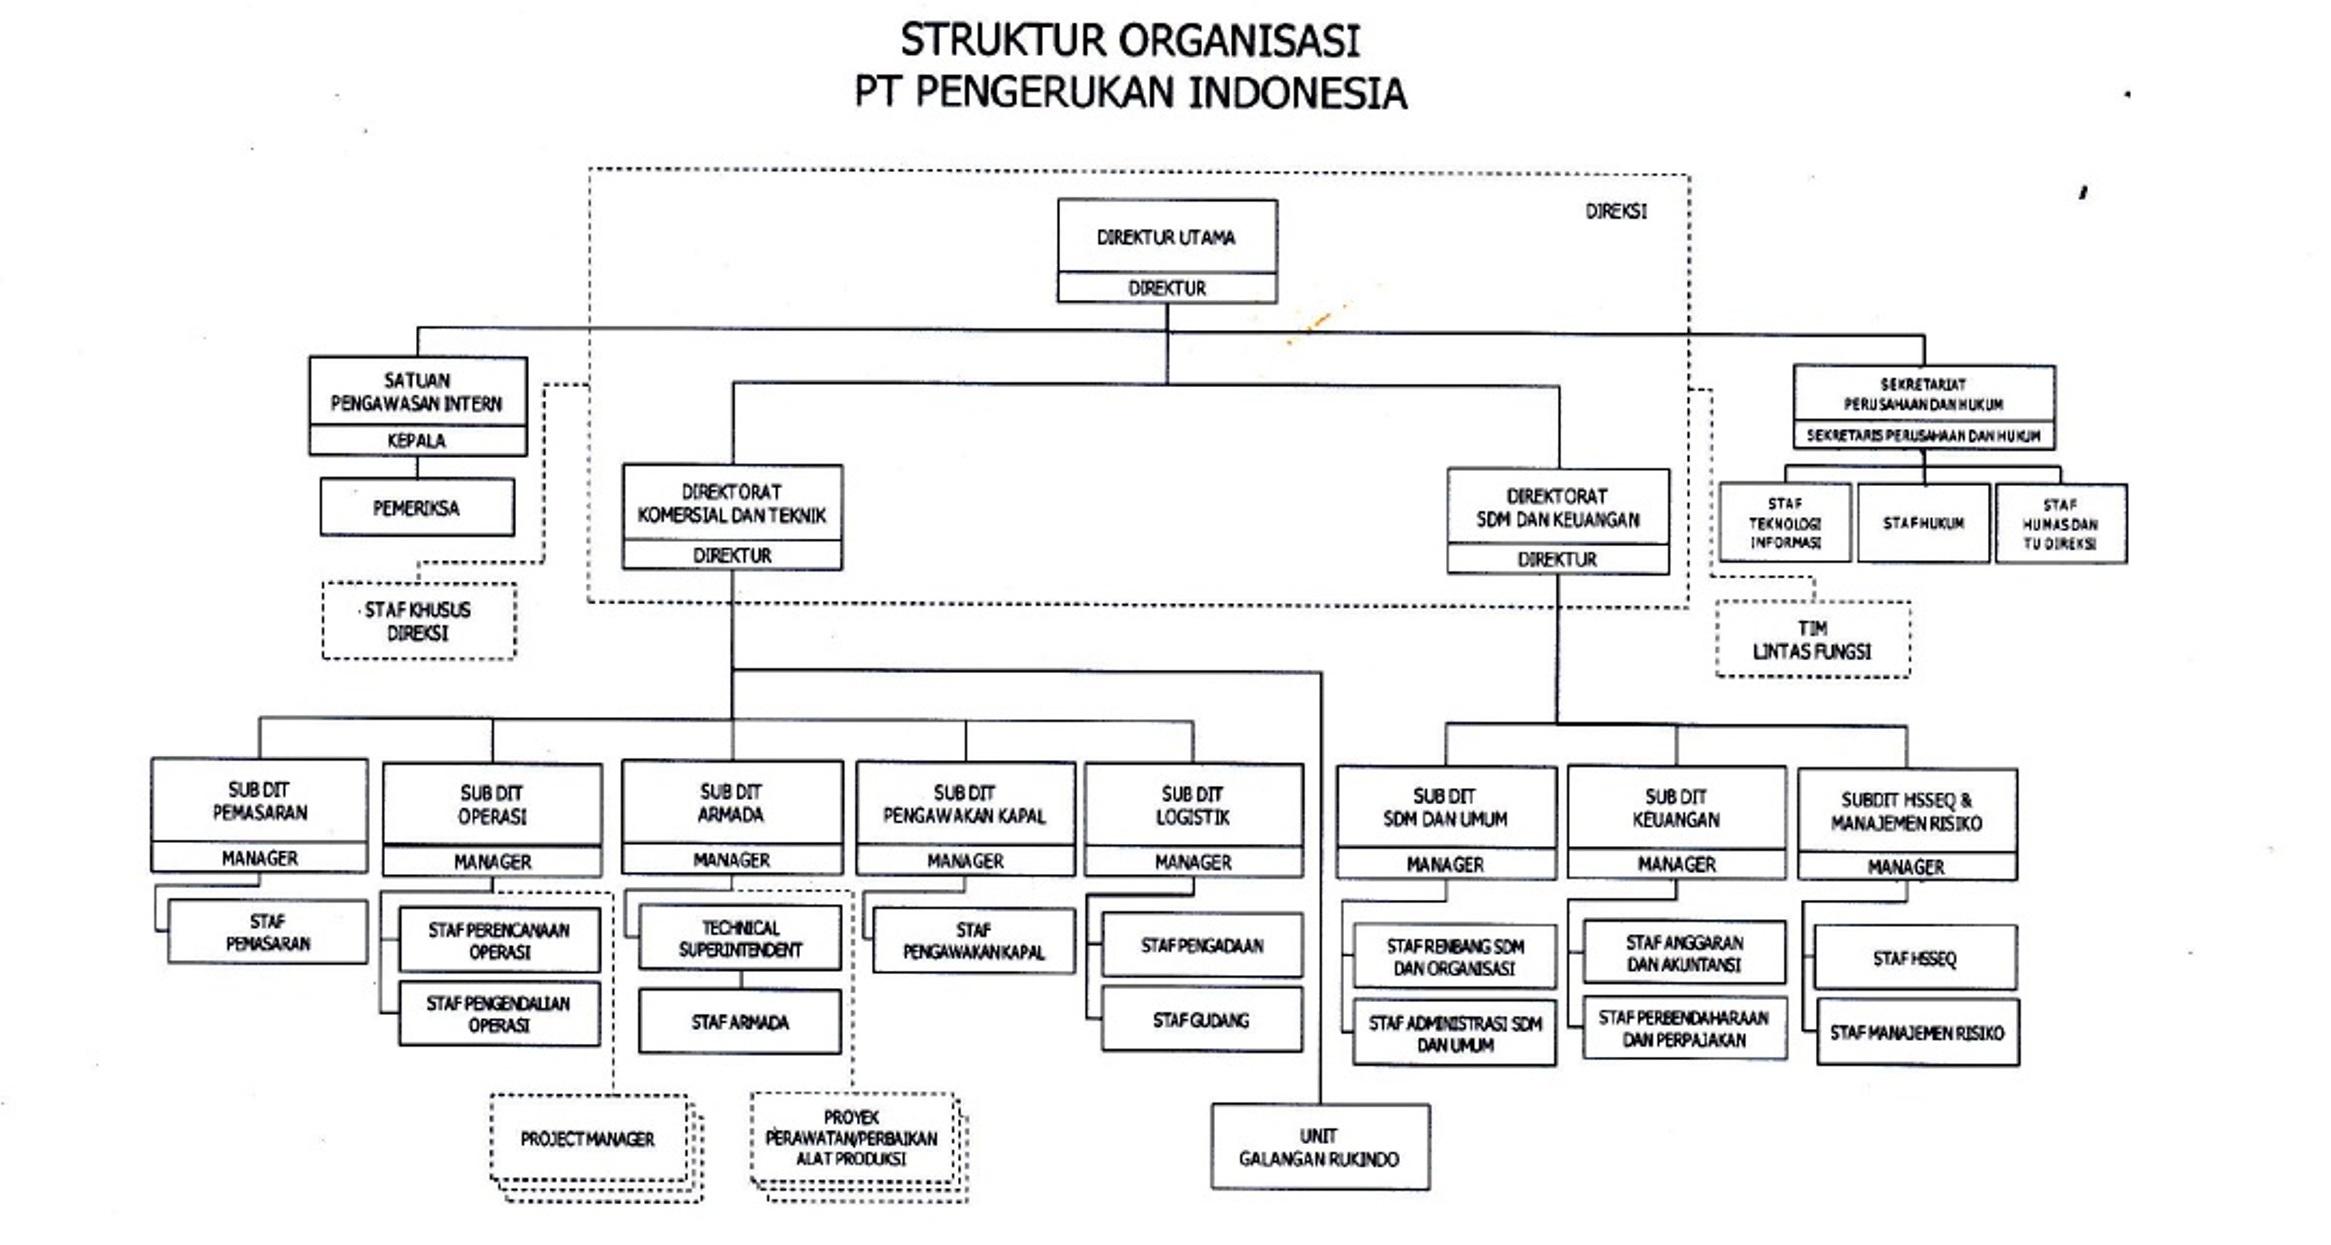 struktur organisasi pt pengerukan indonesia Struktur Organisasi CV di bawah ini adalah struktur organisasi pt pengerukan indonesia saat ini